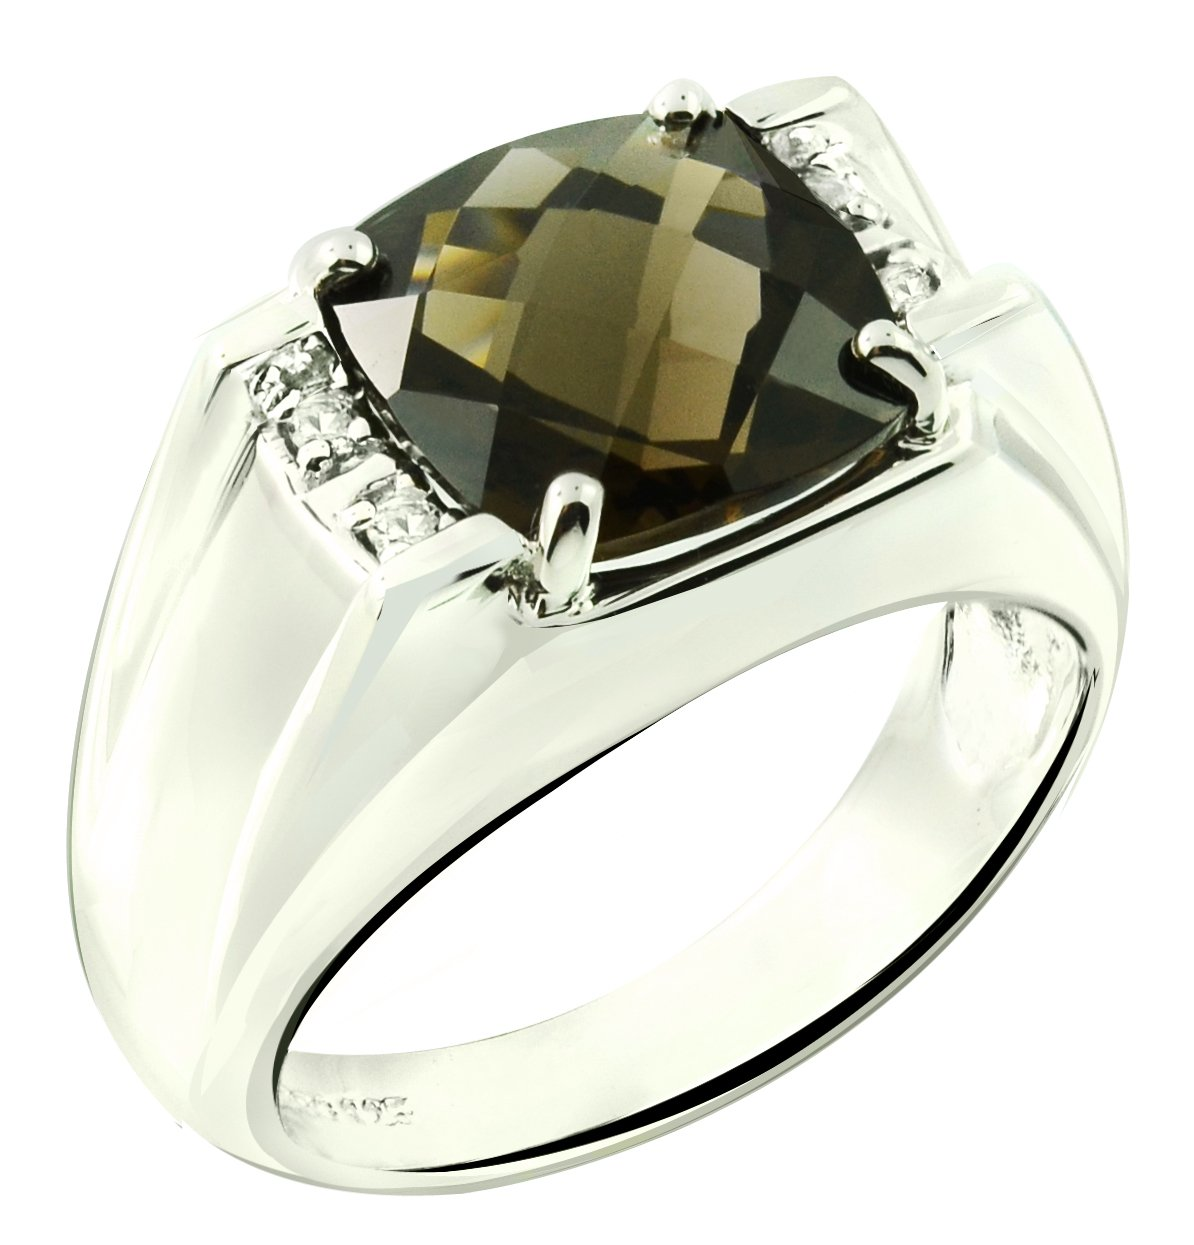 RB Gems Sterling Silver 925 STATEMENT Ring GENUINE GEMSTONE Cushion 10 mm with Rhodium-Plated Finish (11, smoky-quartz)